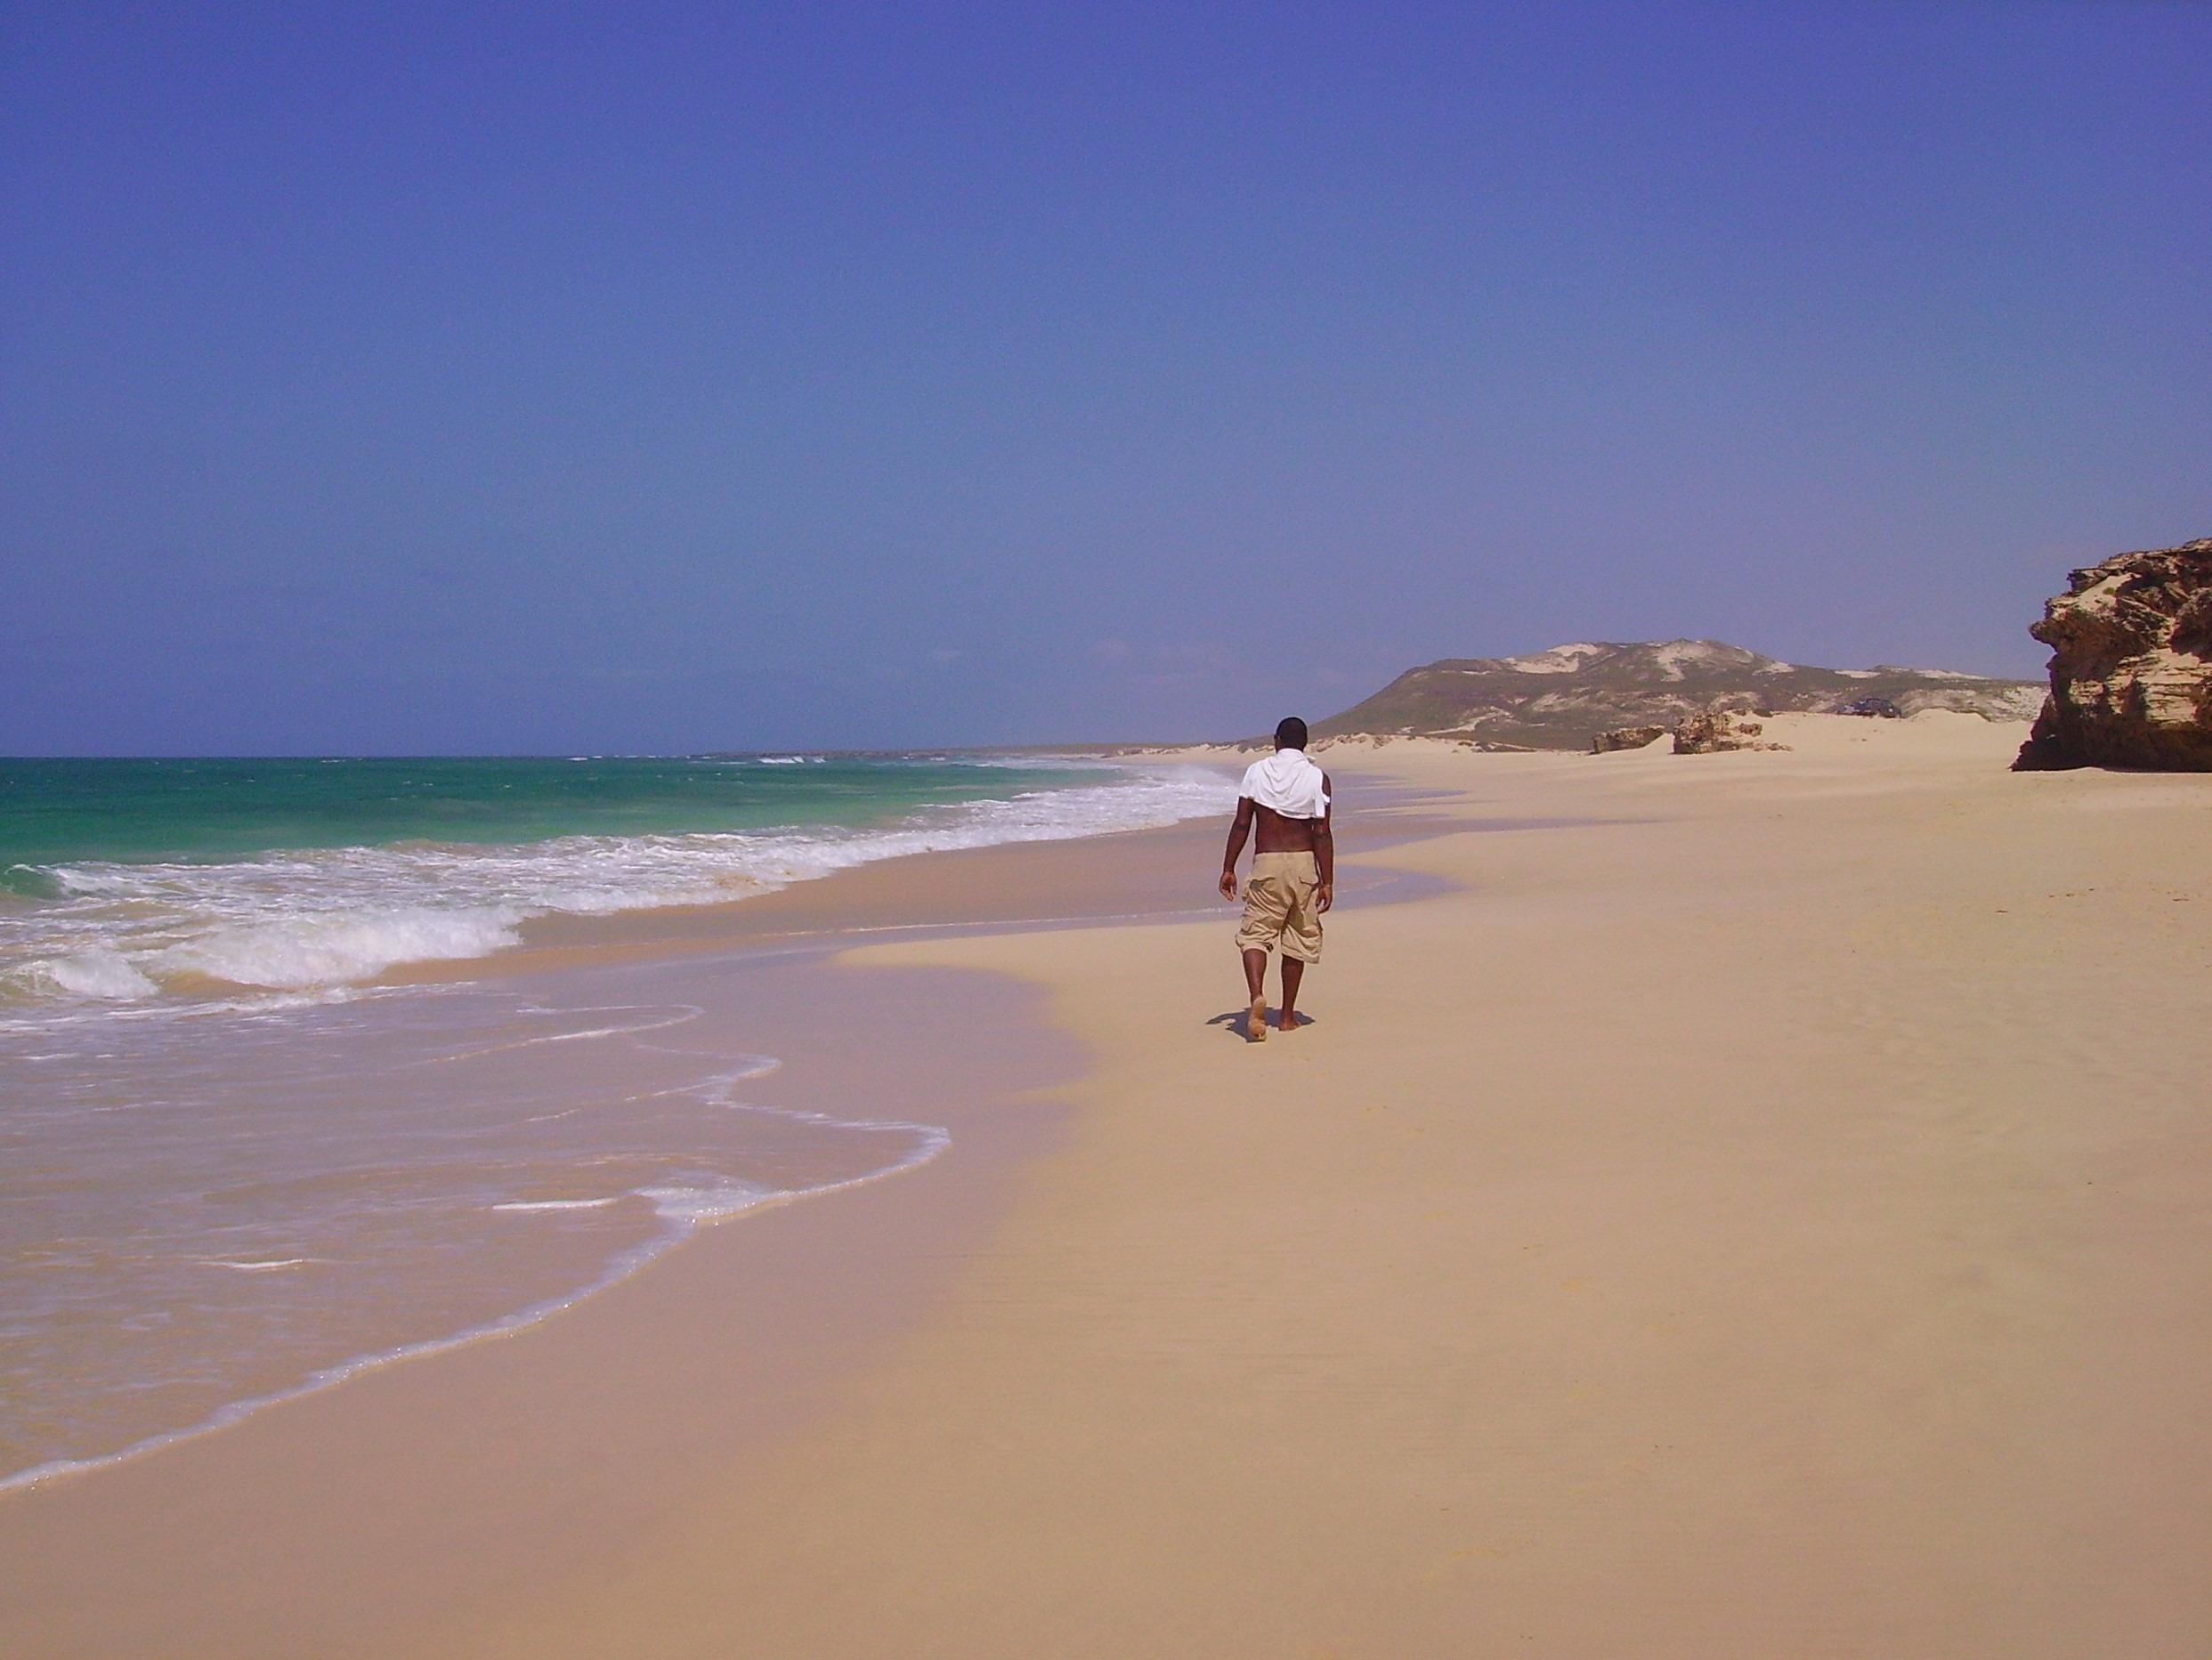 [cml_media_alt id='5165']Boa Vista - Capo Verde - Credits Nico[/cml_media_alt]